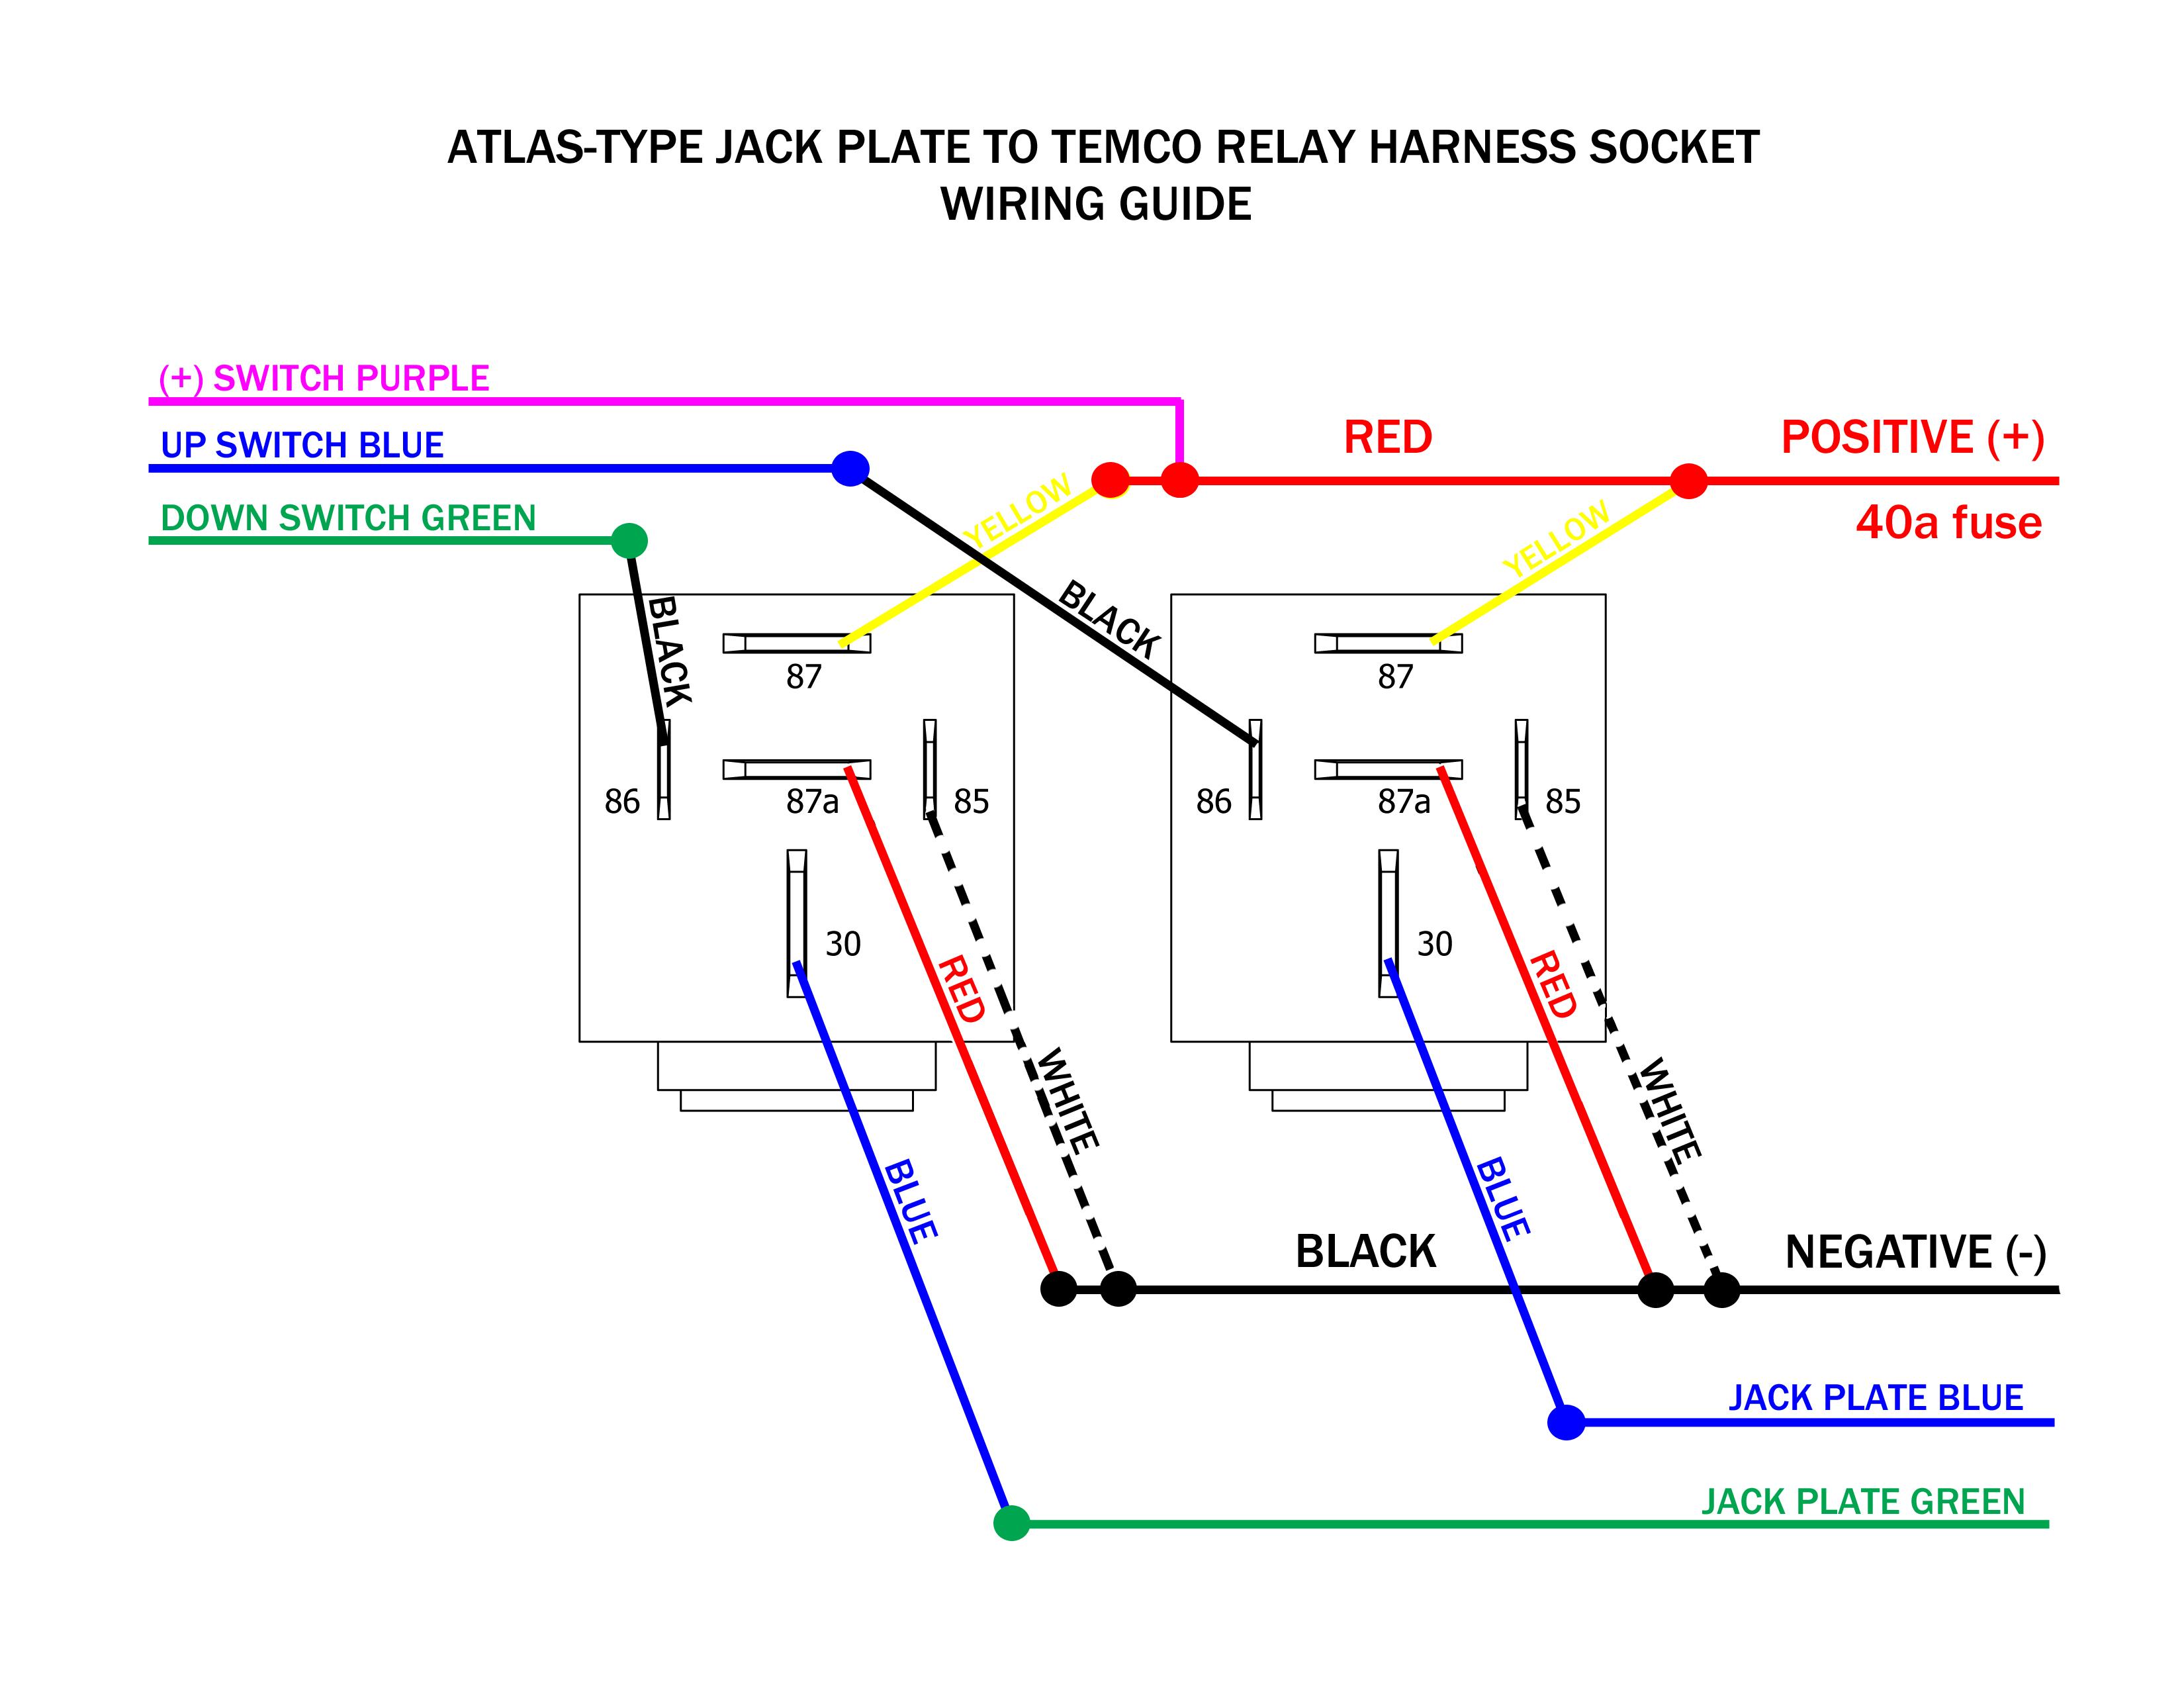 For Atlas Jack Plate Wiring Harness Need Jack Plate Help Advice General Forum Mbgforum Com